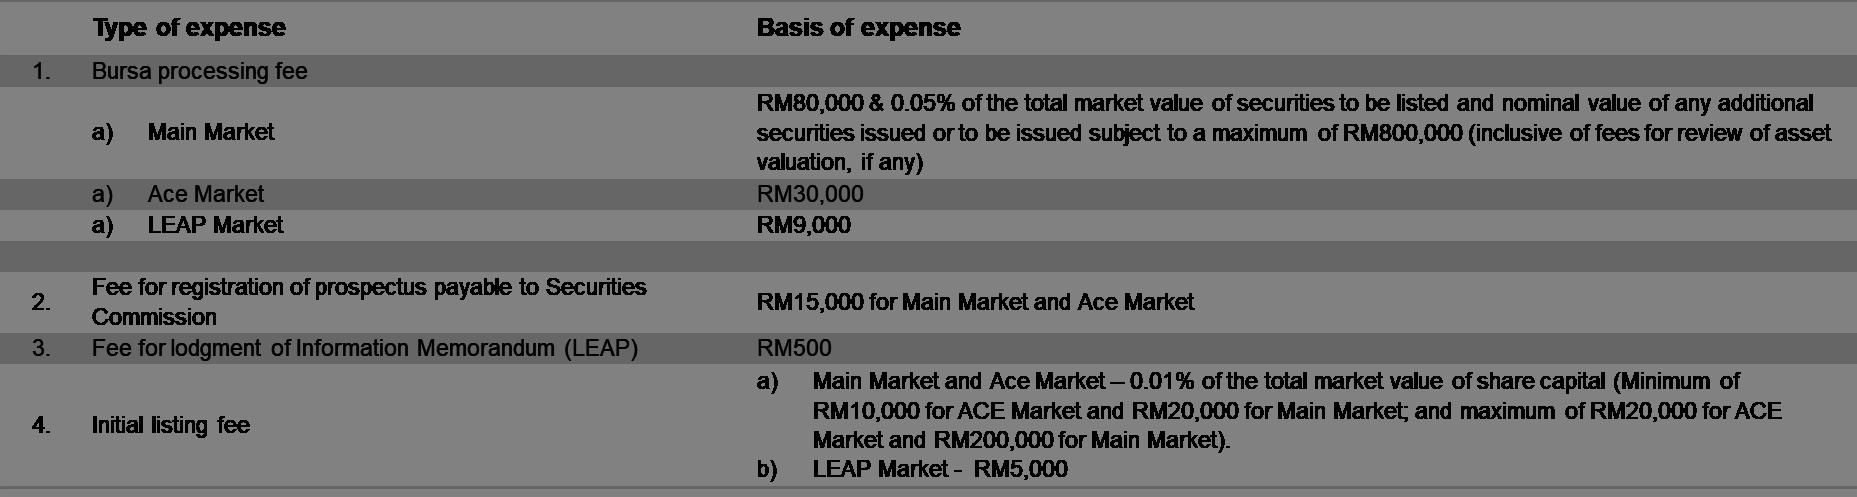 IPO_expense1